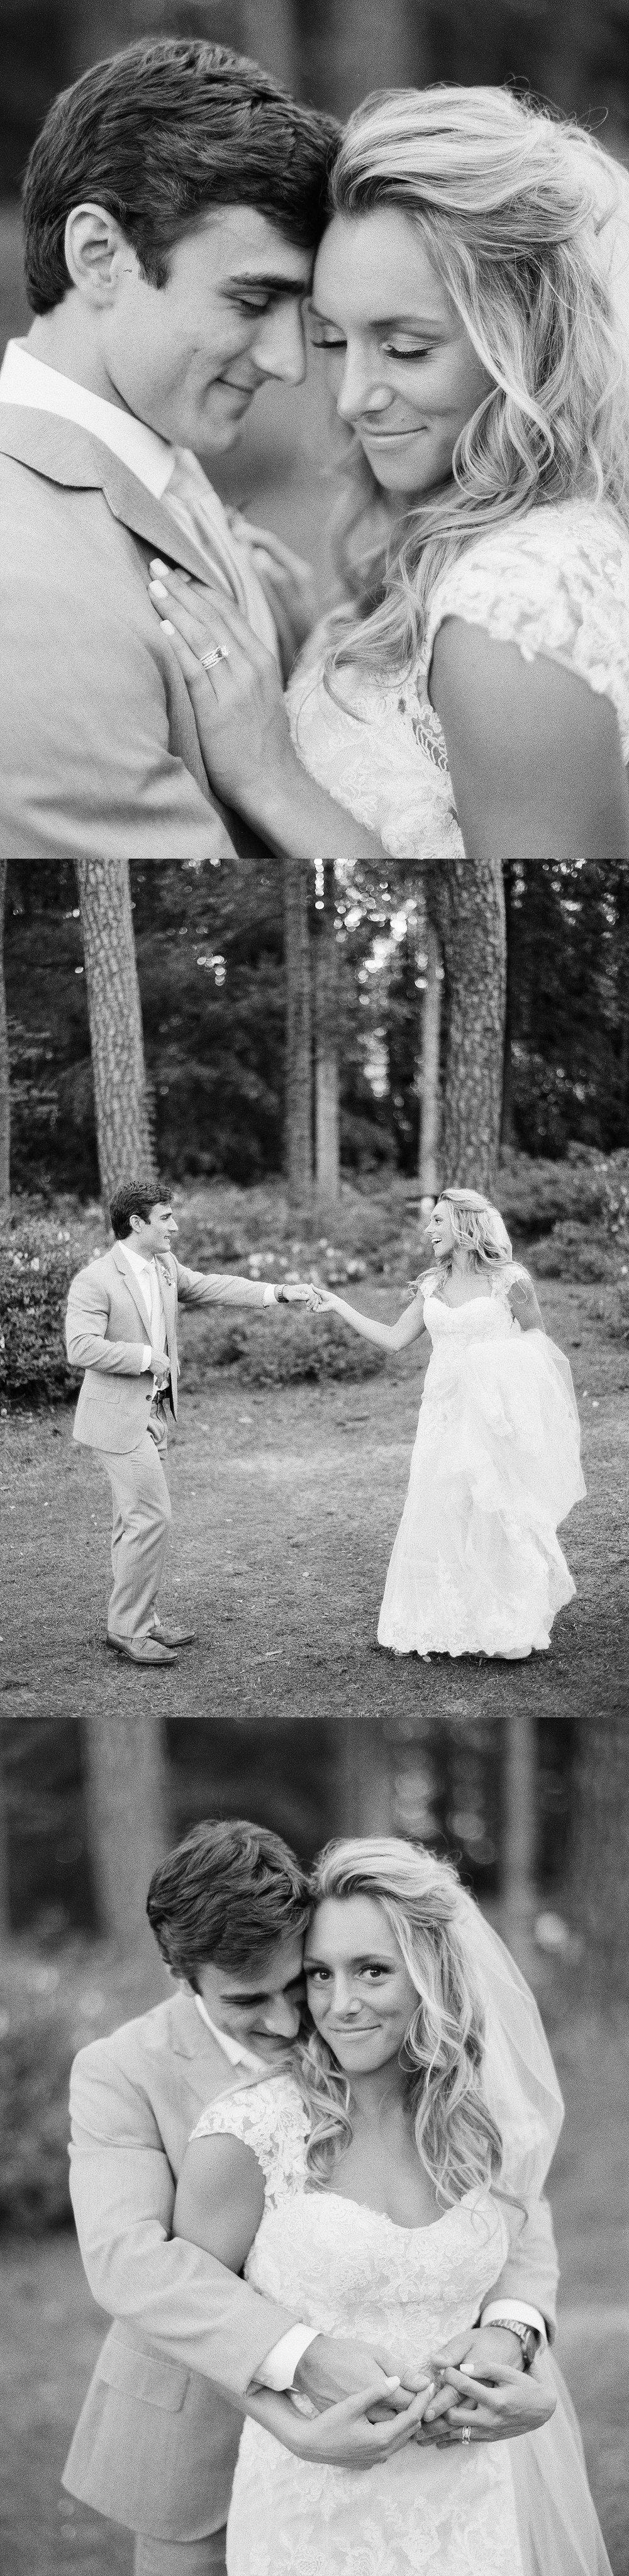 197country-club-johns-creek-wedding-anderson-.jpg